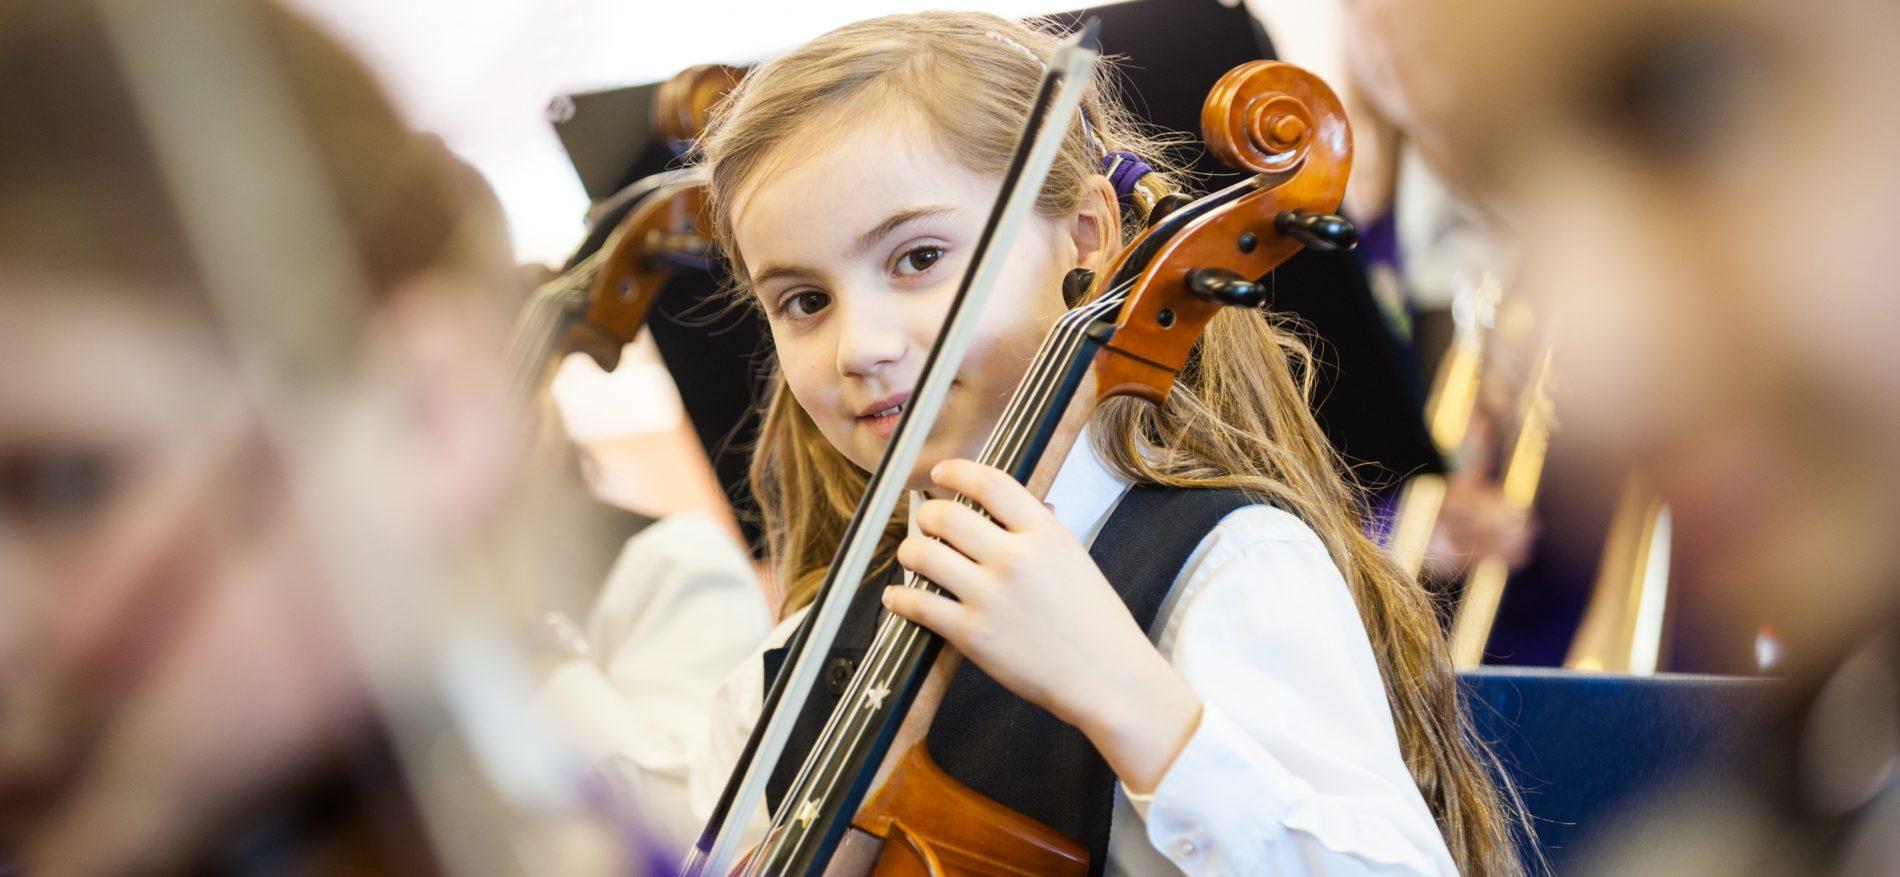 school girl playing cello